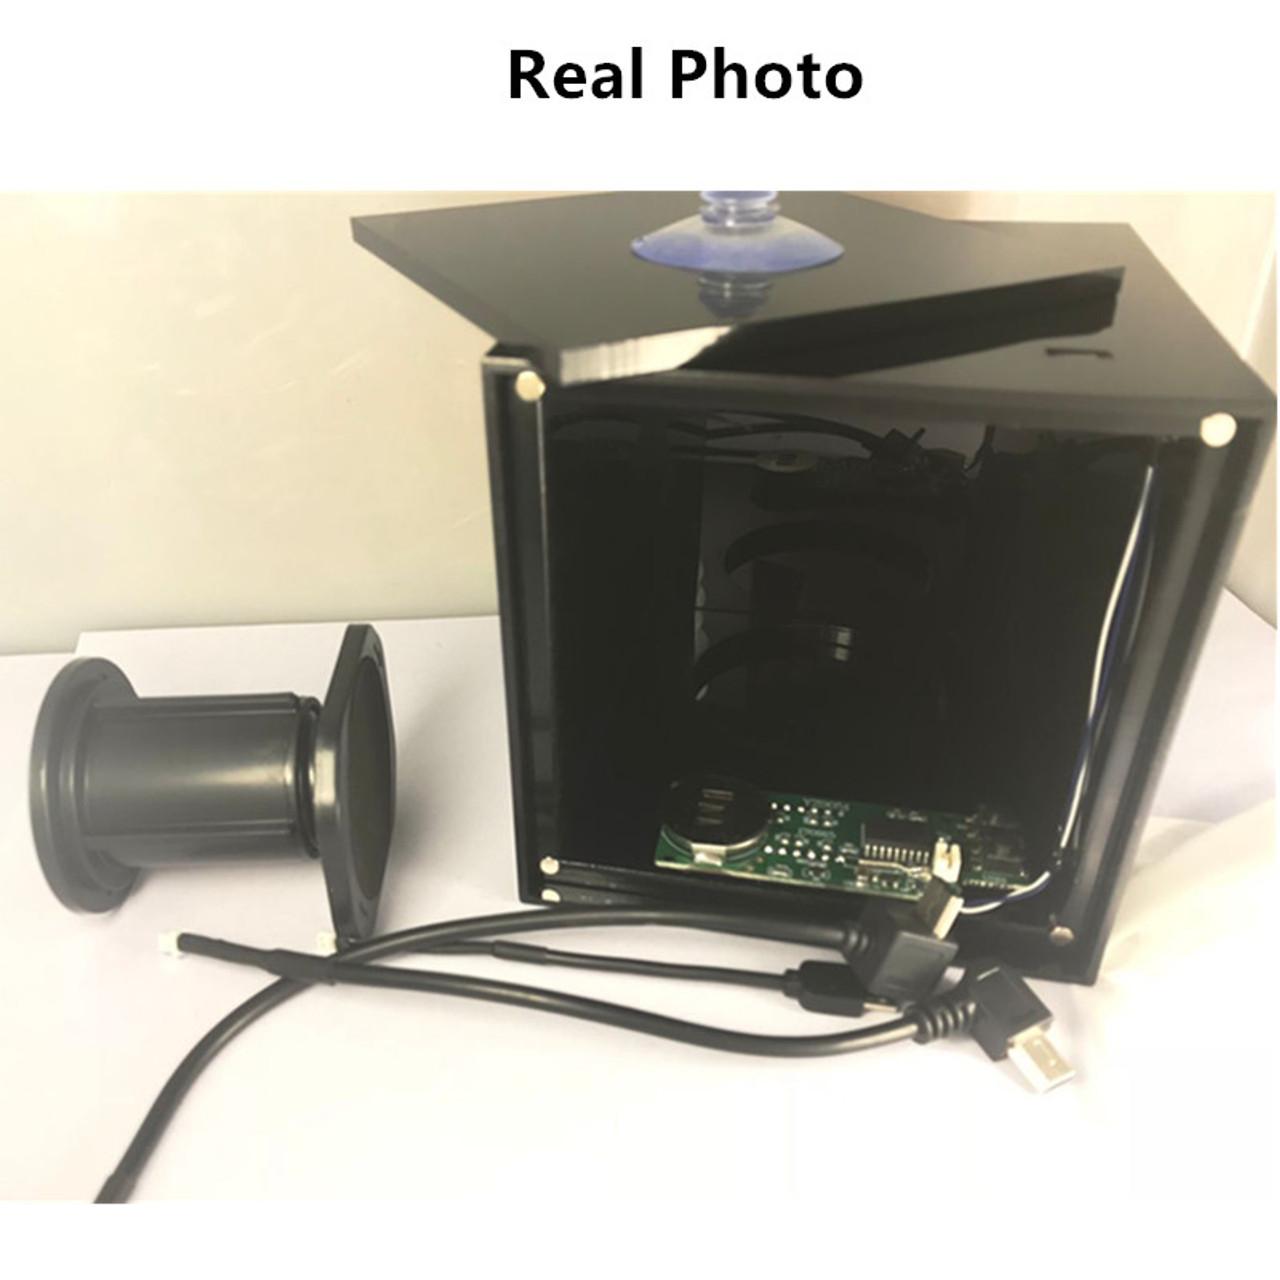 Nest Nanny Cam Box - Enclosure For Nest Cam/Dropcam/GoPro Hero 4, Hero 5, Changes Camera Into a Spy Camera (Camera Not Included)